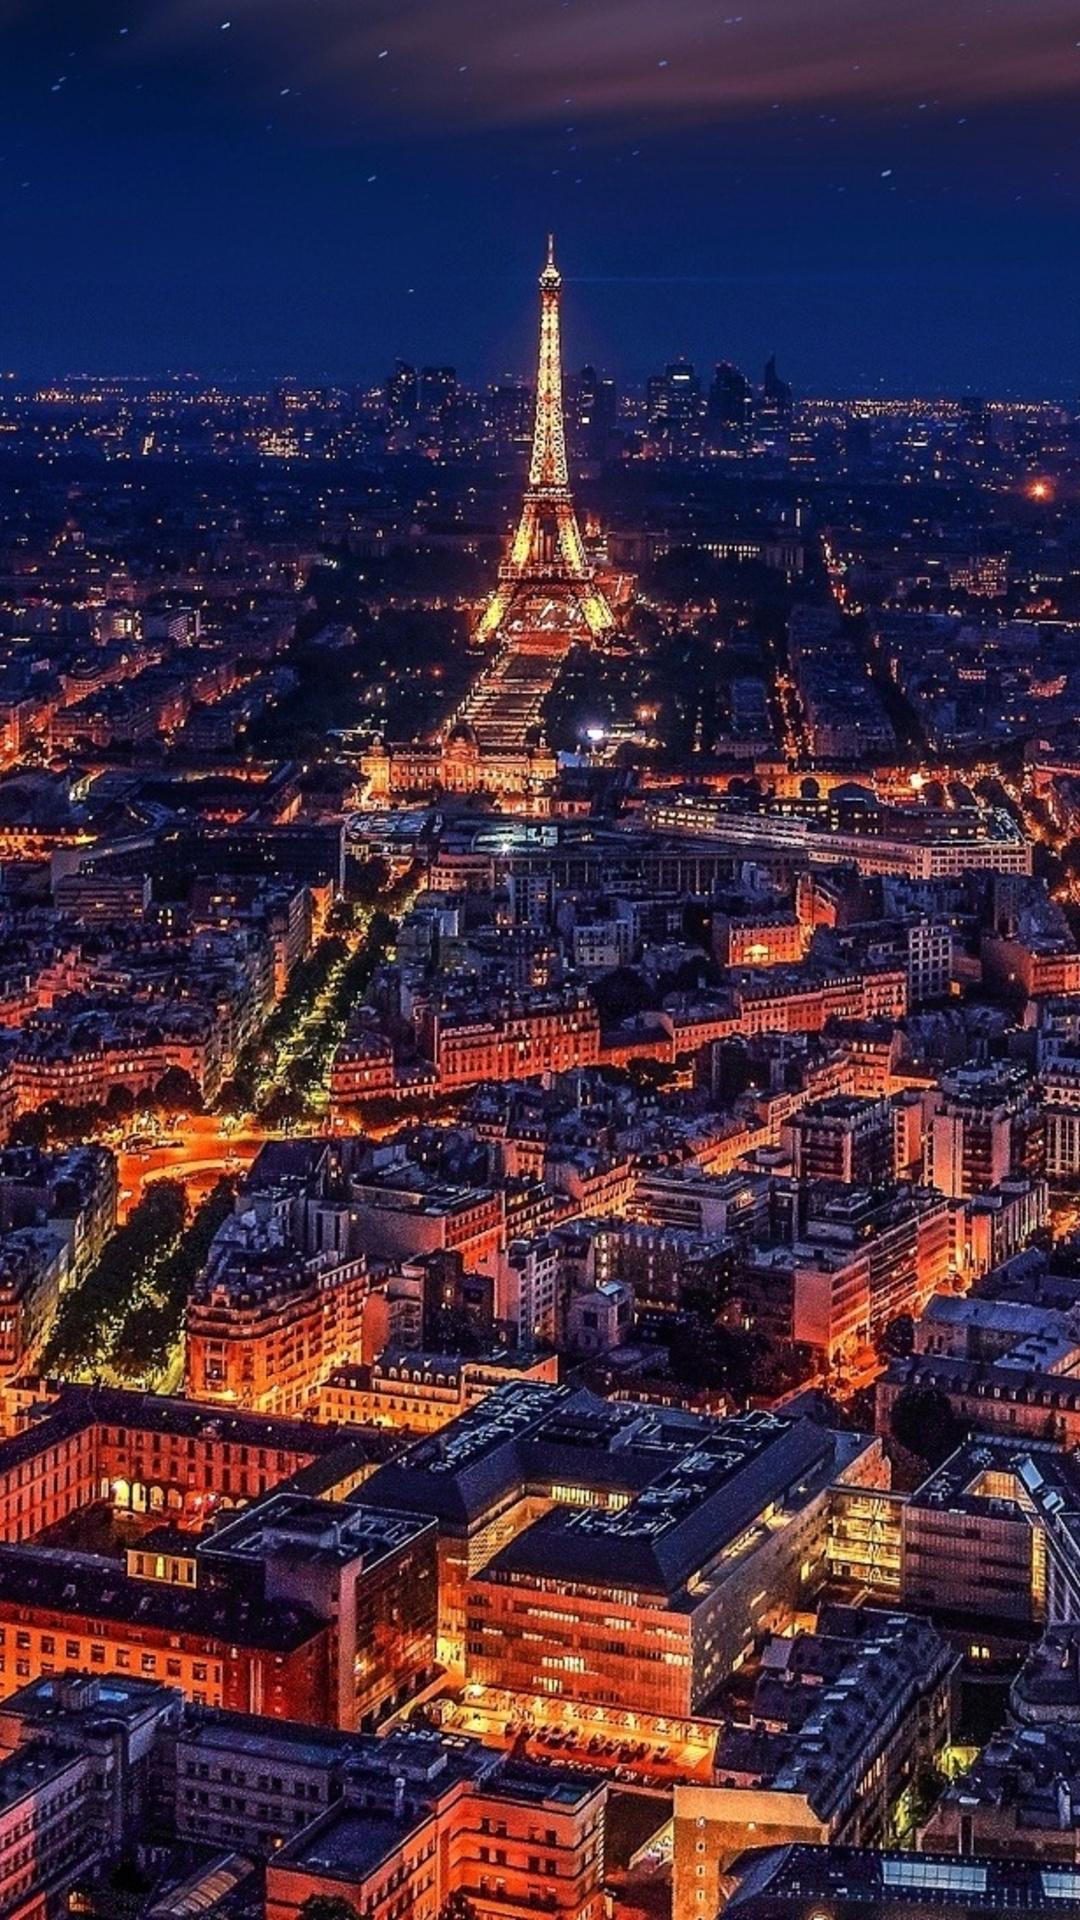 Good Wallpaper Night Iphone 7 - paris-france-eiffel-tower-night-m2-1080x1920  Gallery-246049.jpg